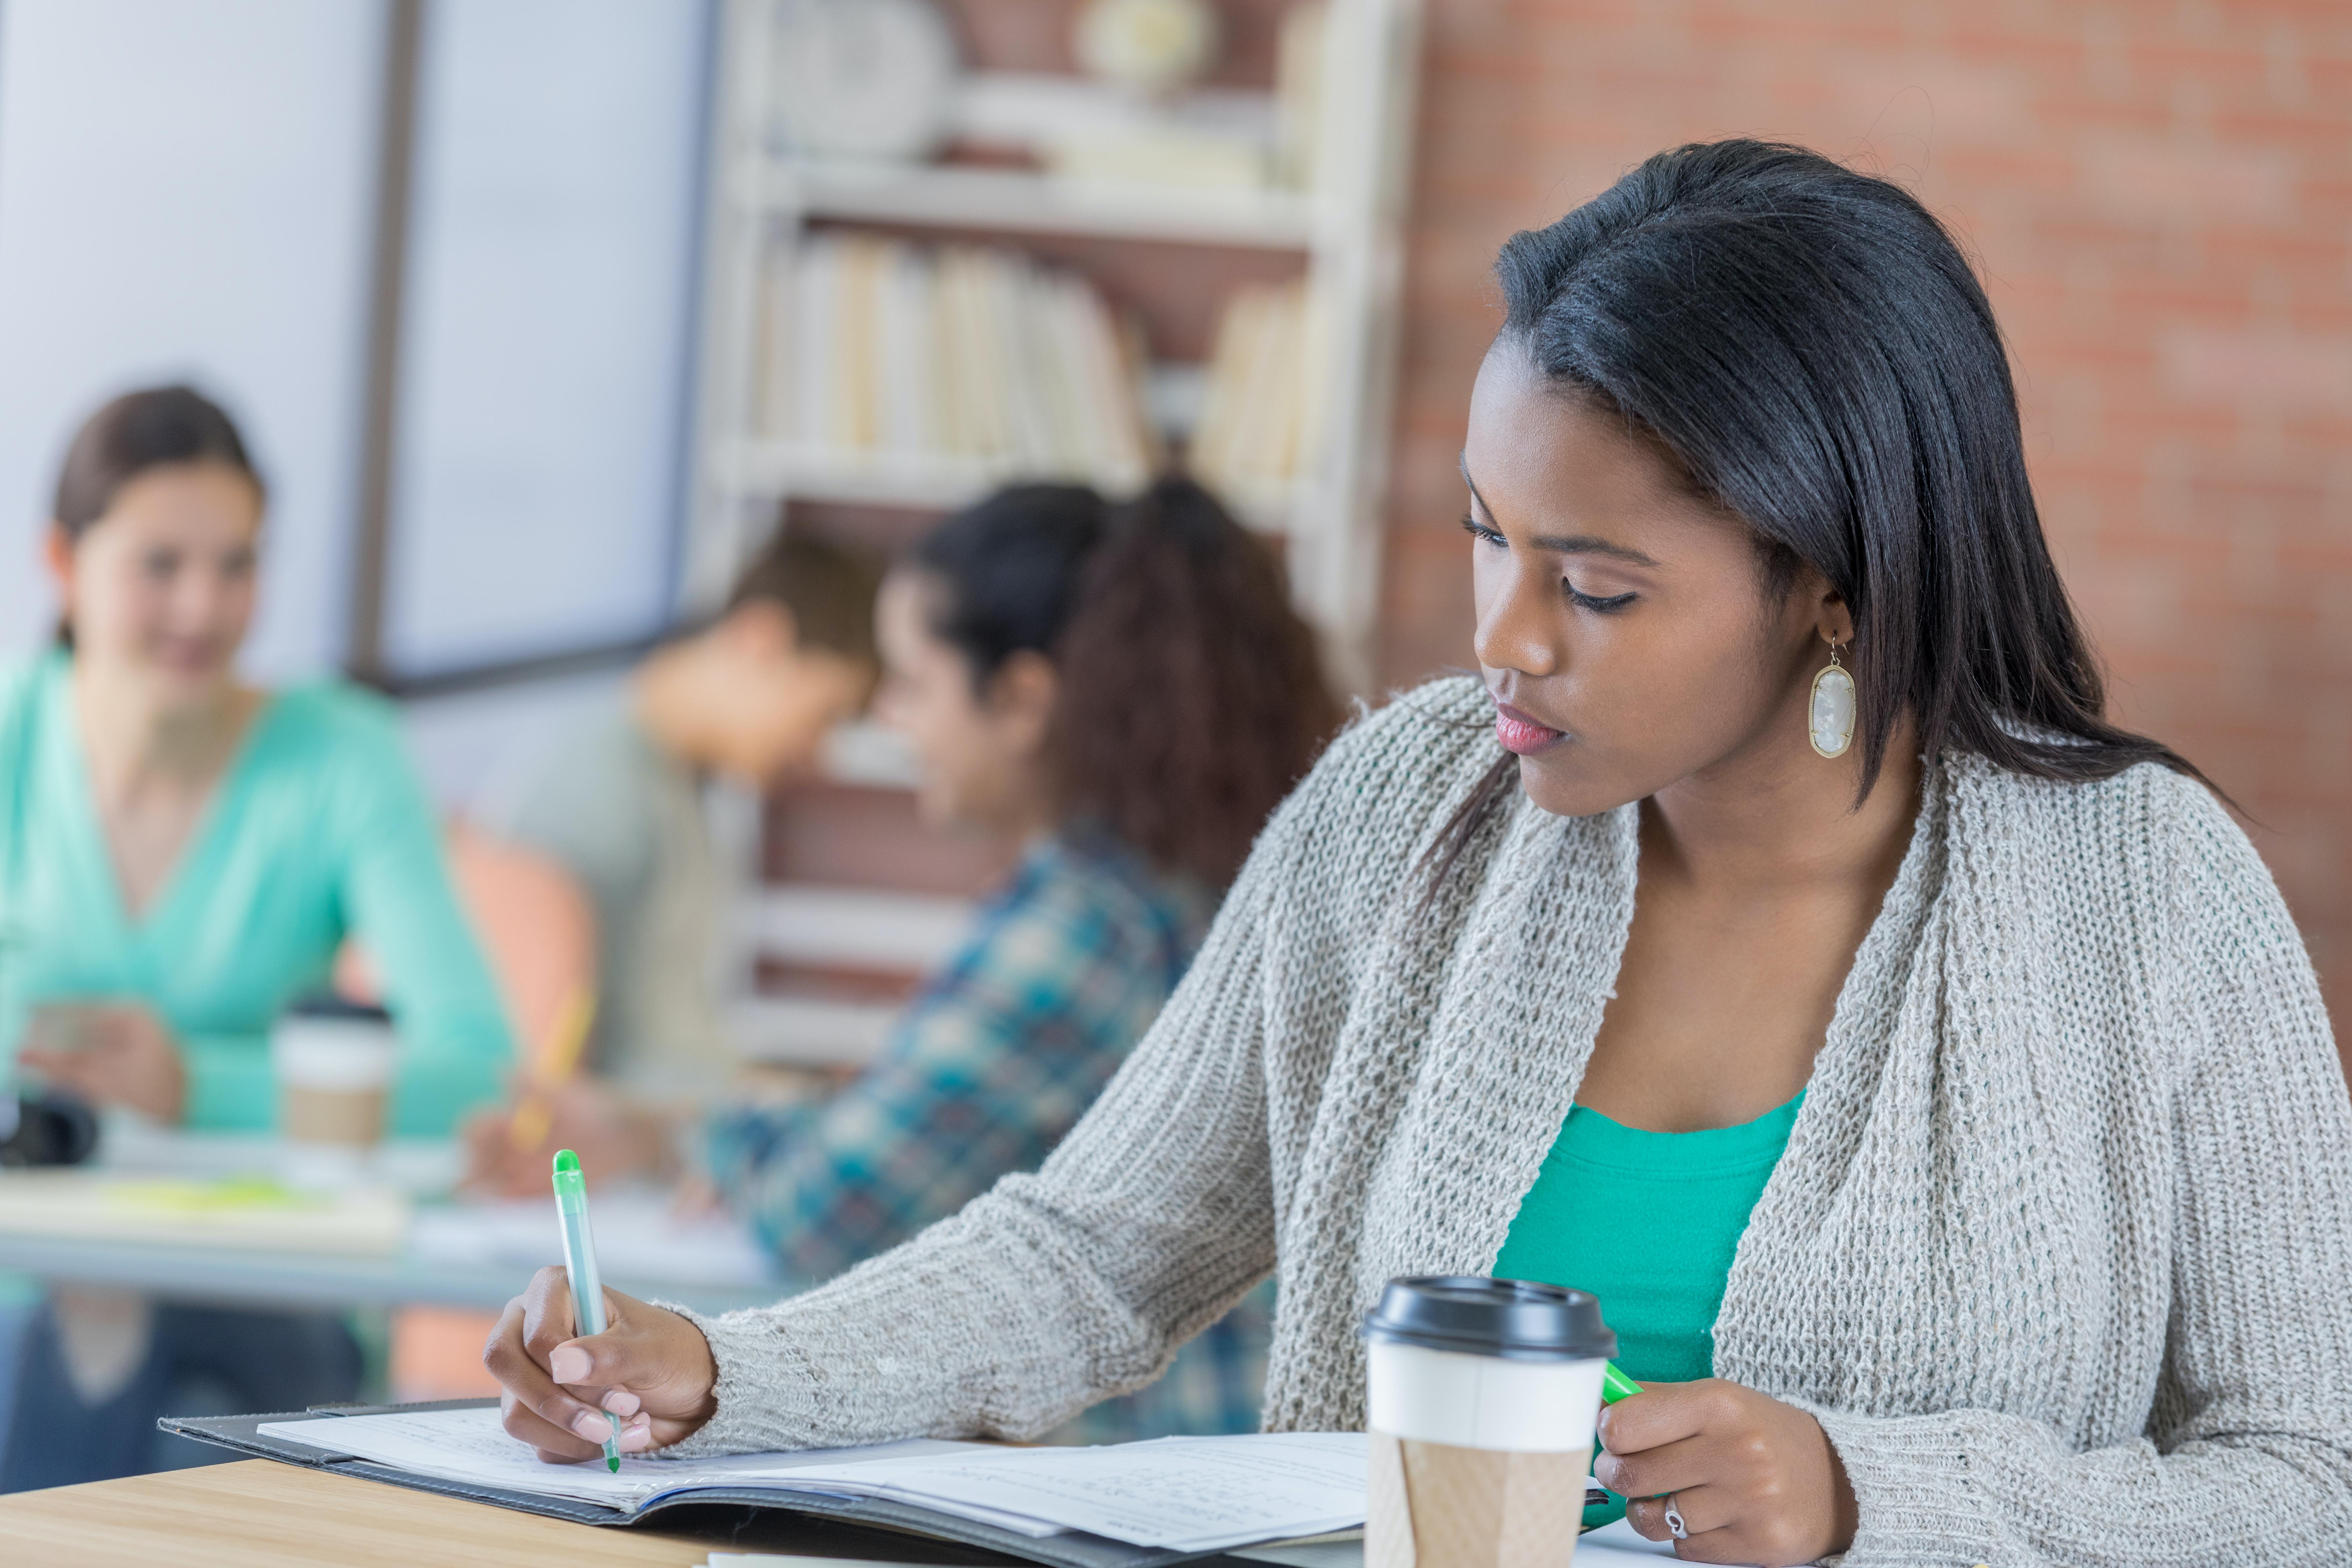 A female graduate healthcare student writes at a desk